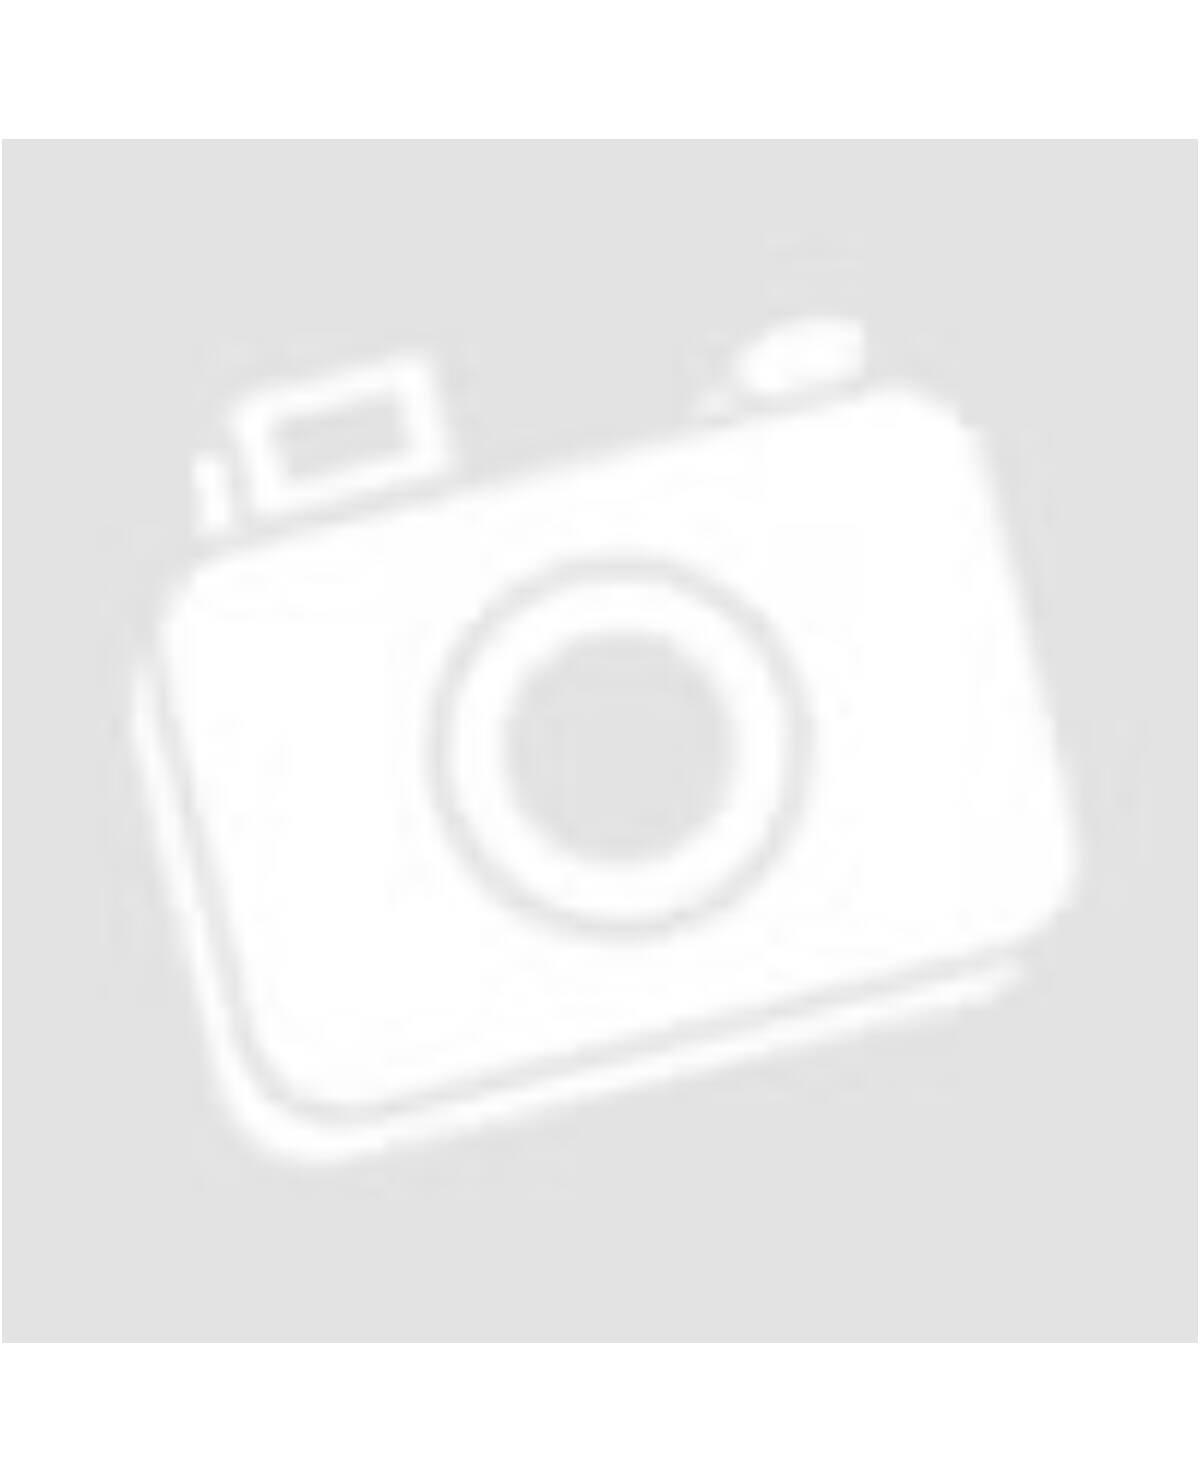 Retroshock theater - LG telefontok - LG - Retroshock Shop d11334f6d3